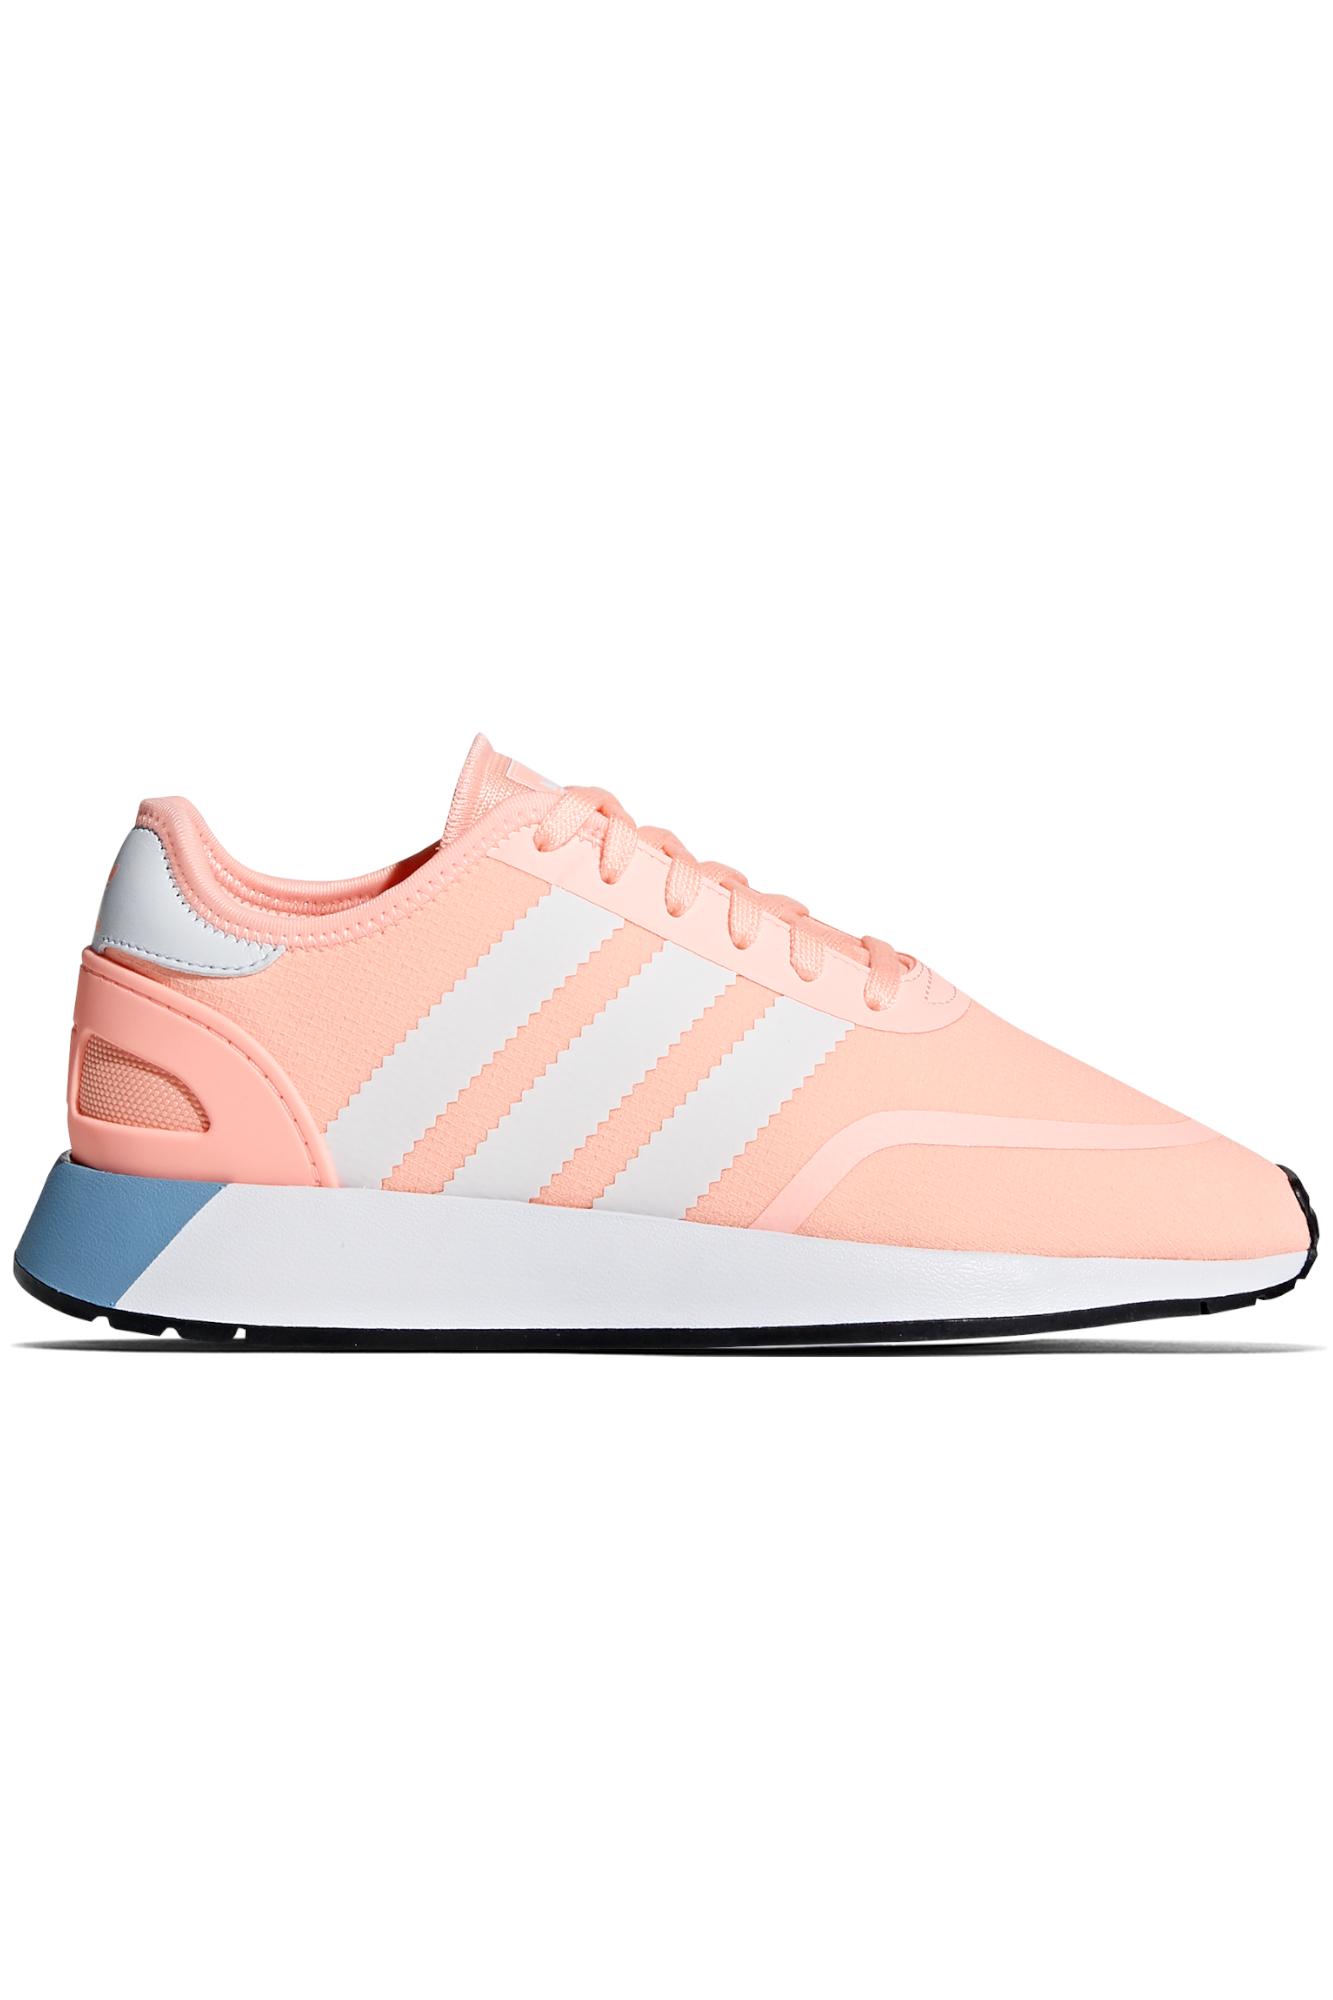 Buty adidas Originals N 5923 B37982 Na co dzień Buty